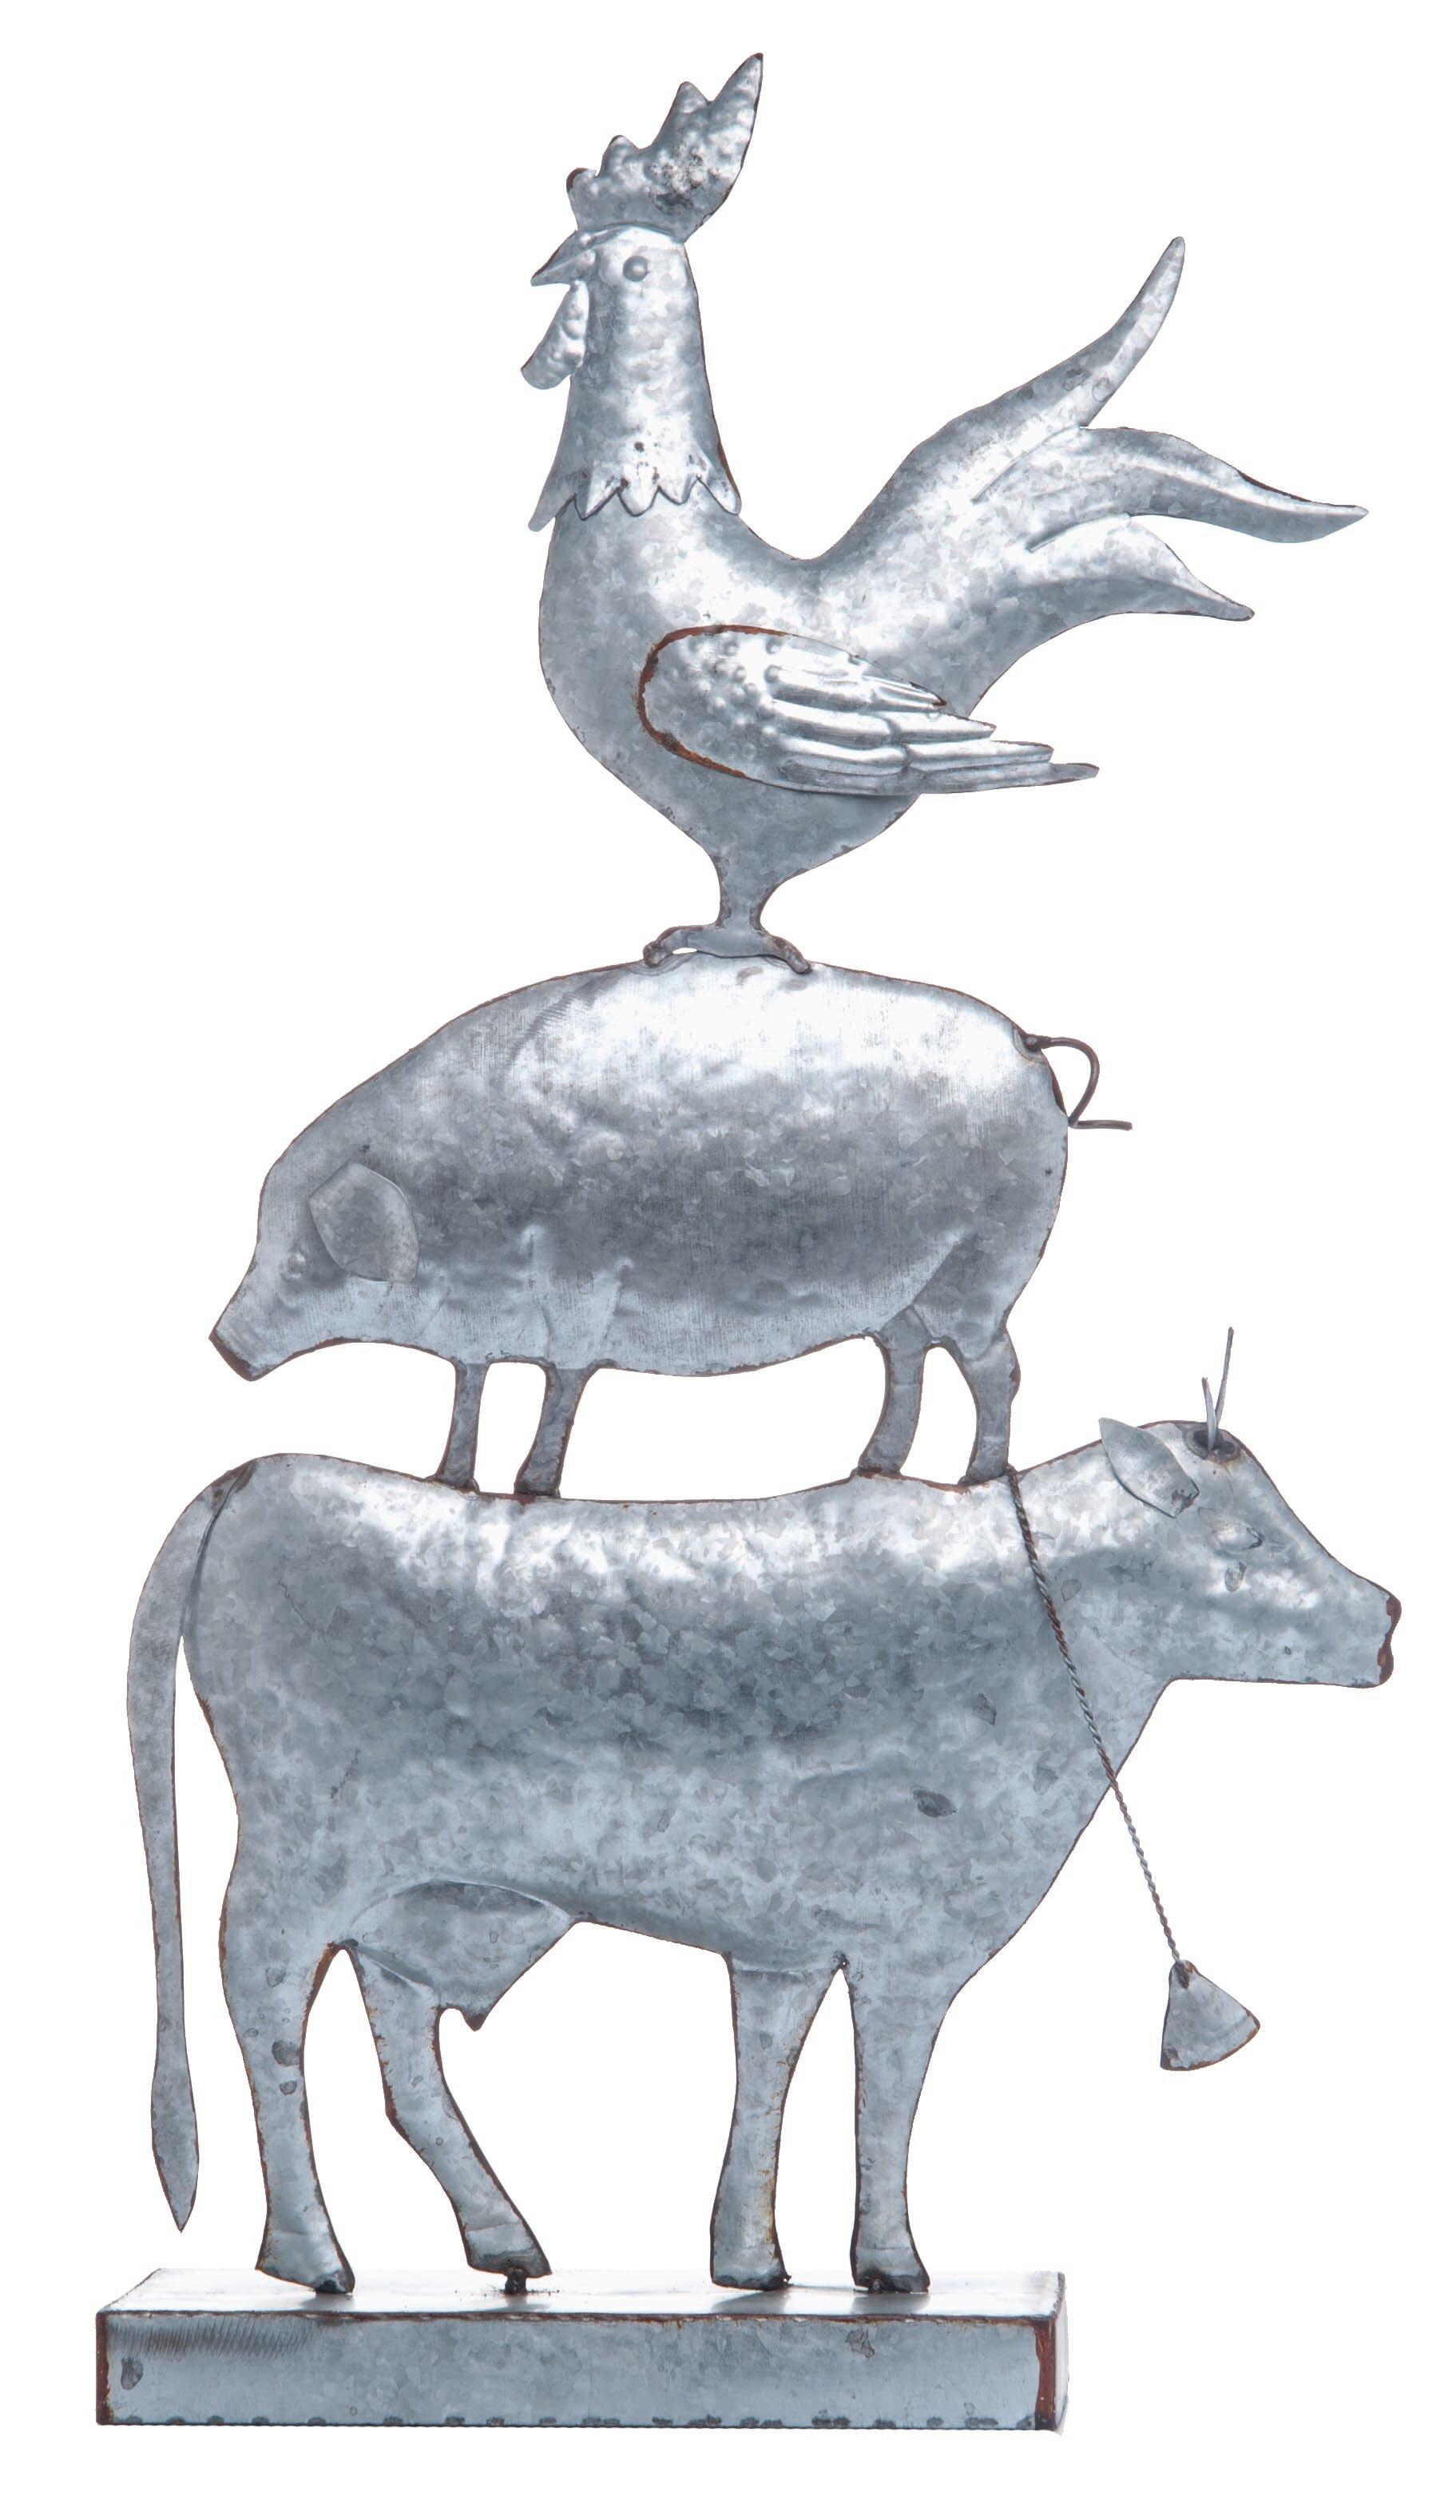 Standing Sheep Statue Farm Animal Sculpture Decor